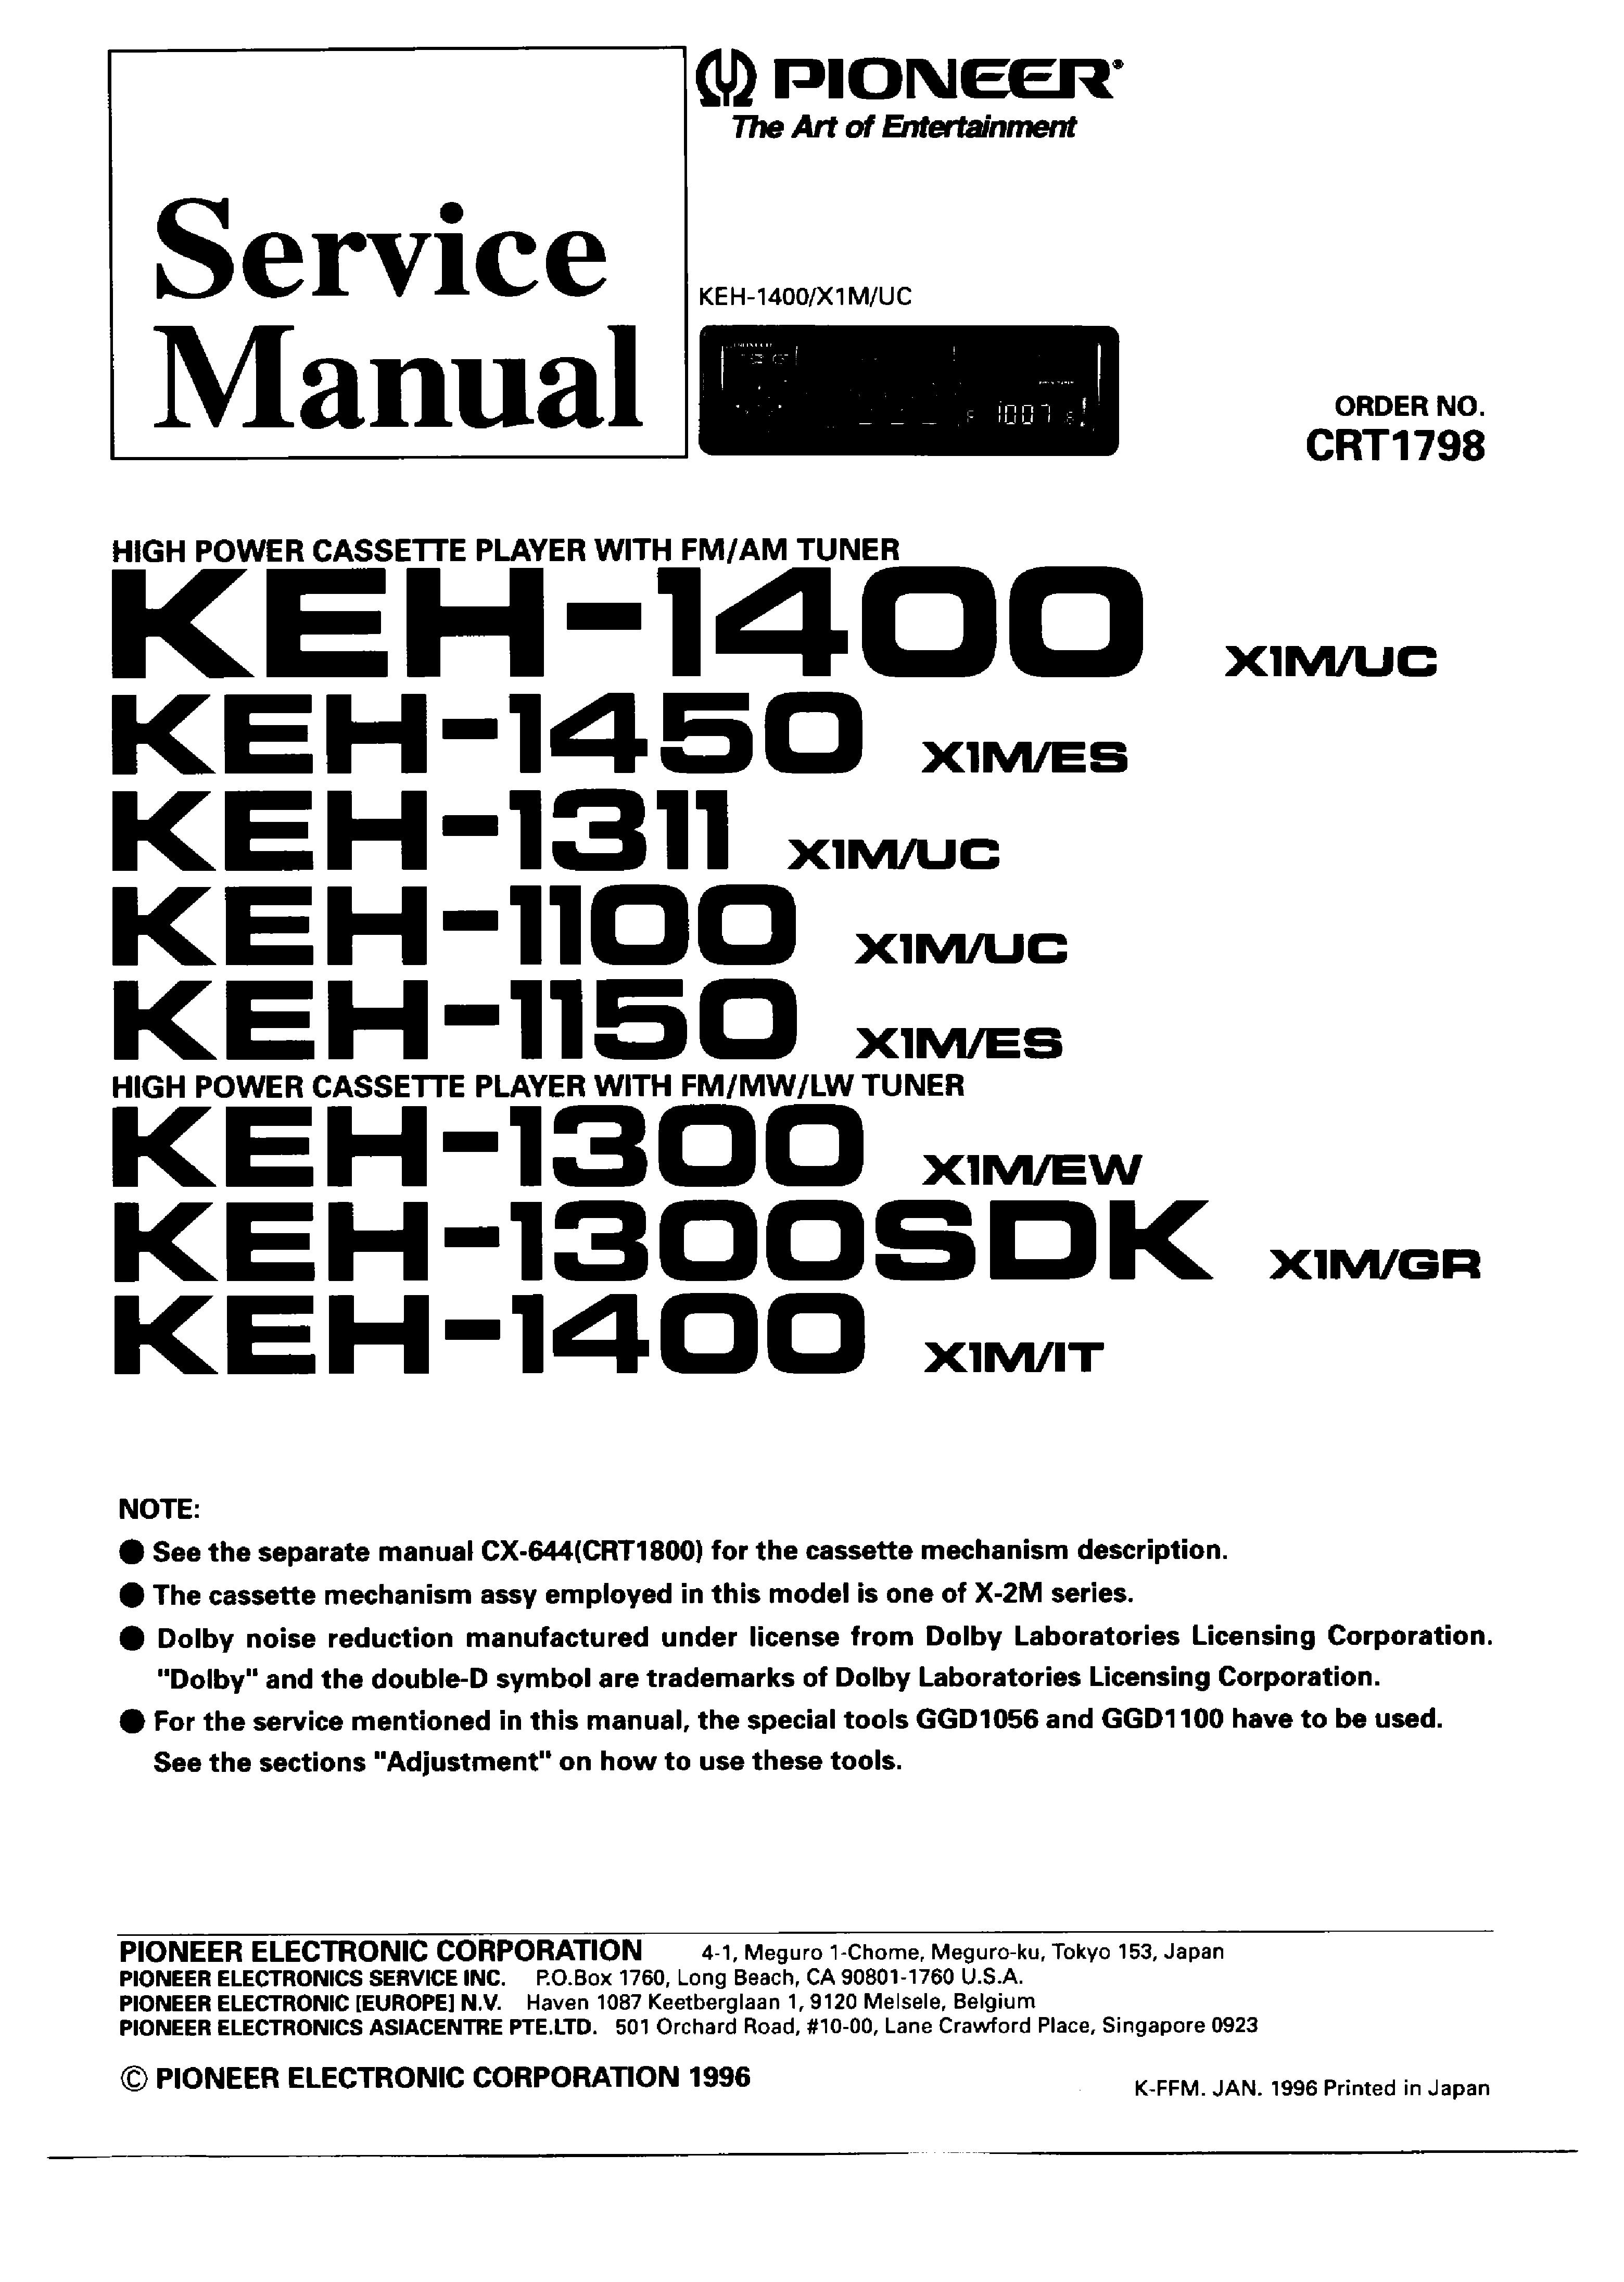 pioneer keh 1100 1150 1311 1300 1400 1450 crt1798 service manual free schematics